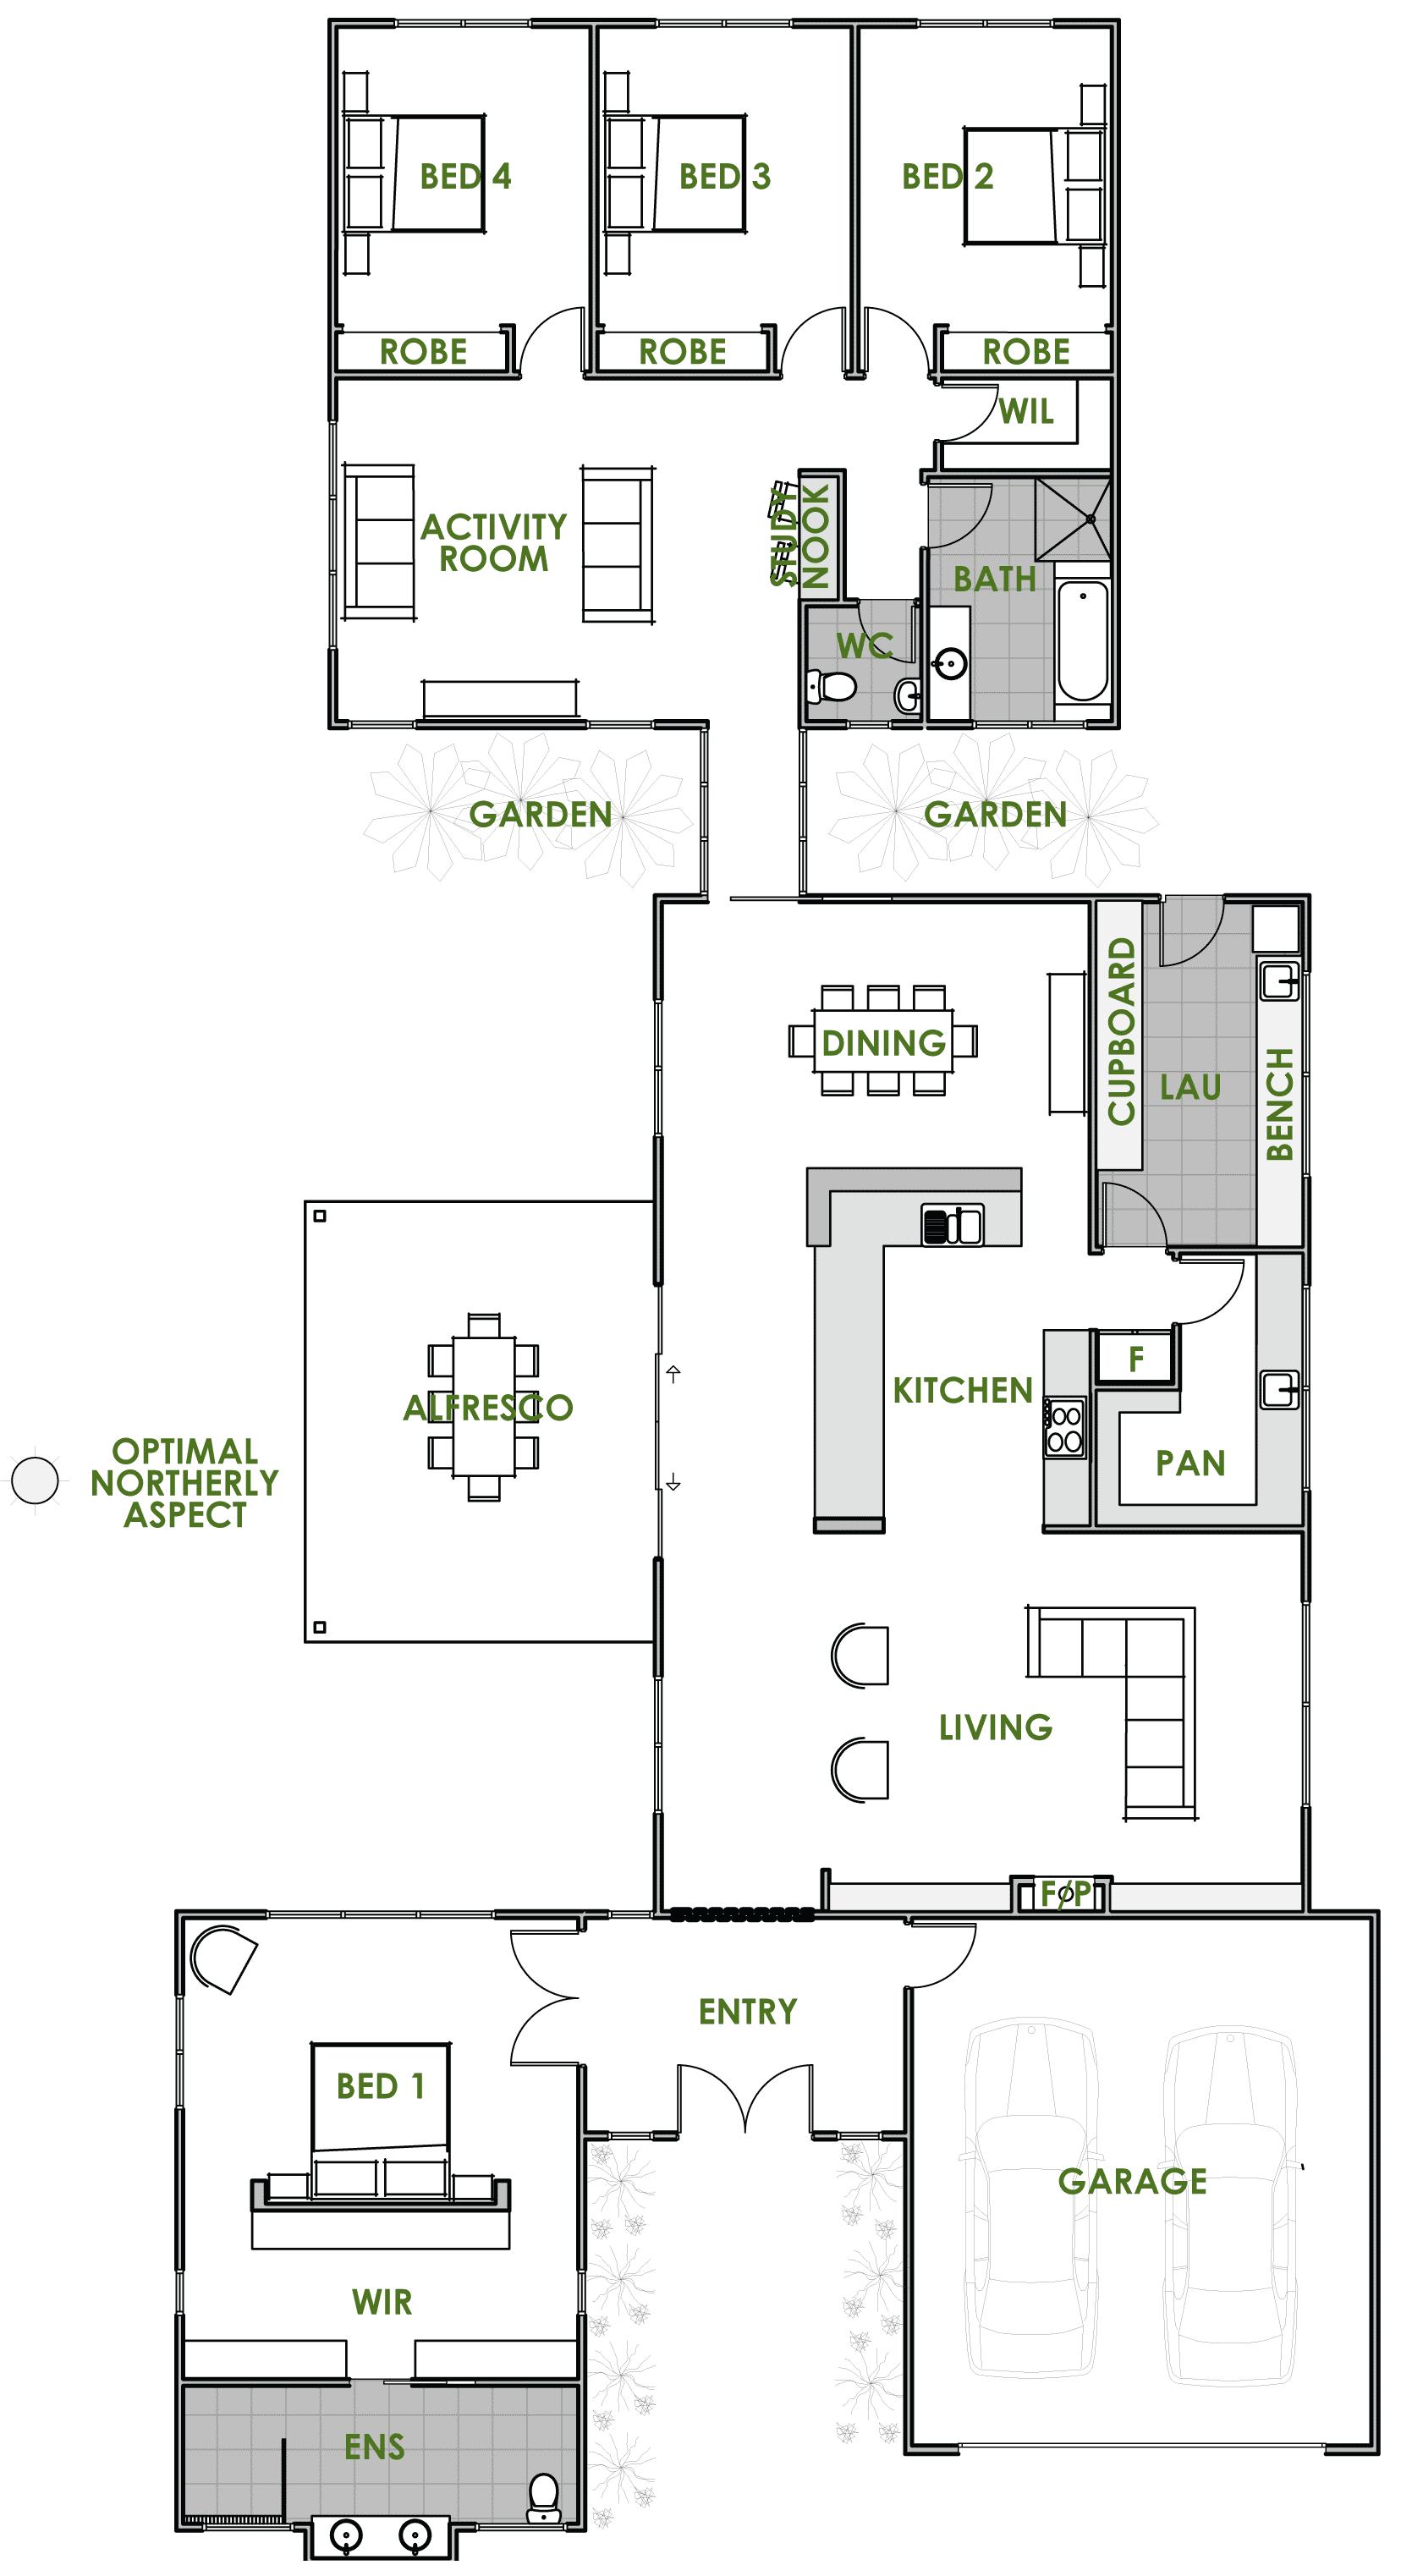 Floor Plan Friday An energy efficient home House plans